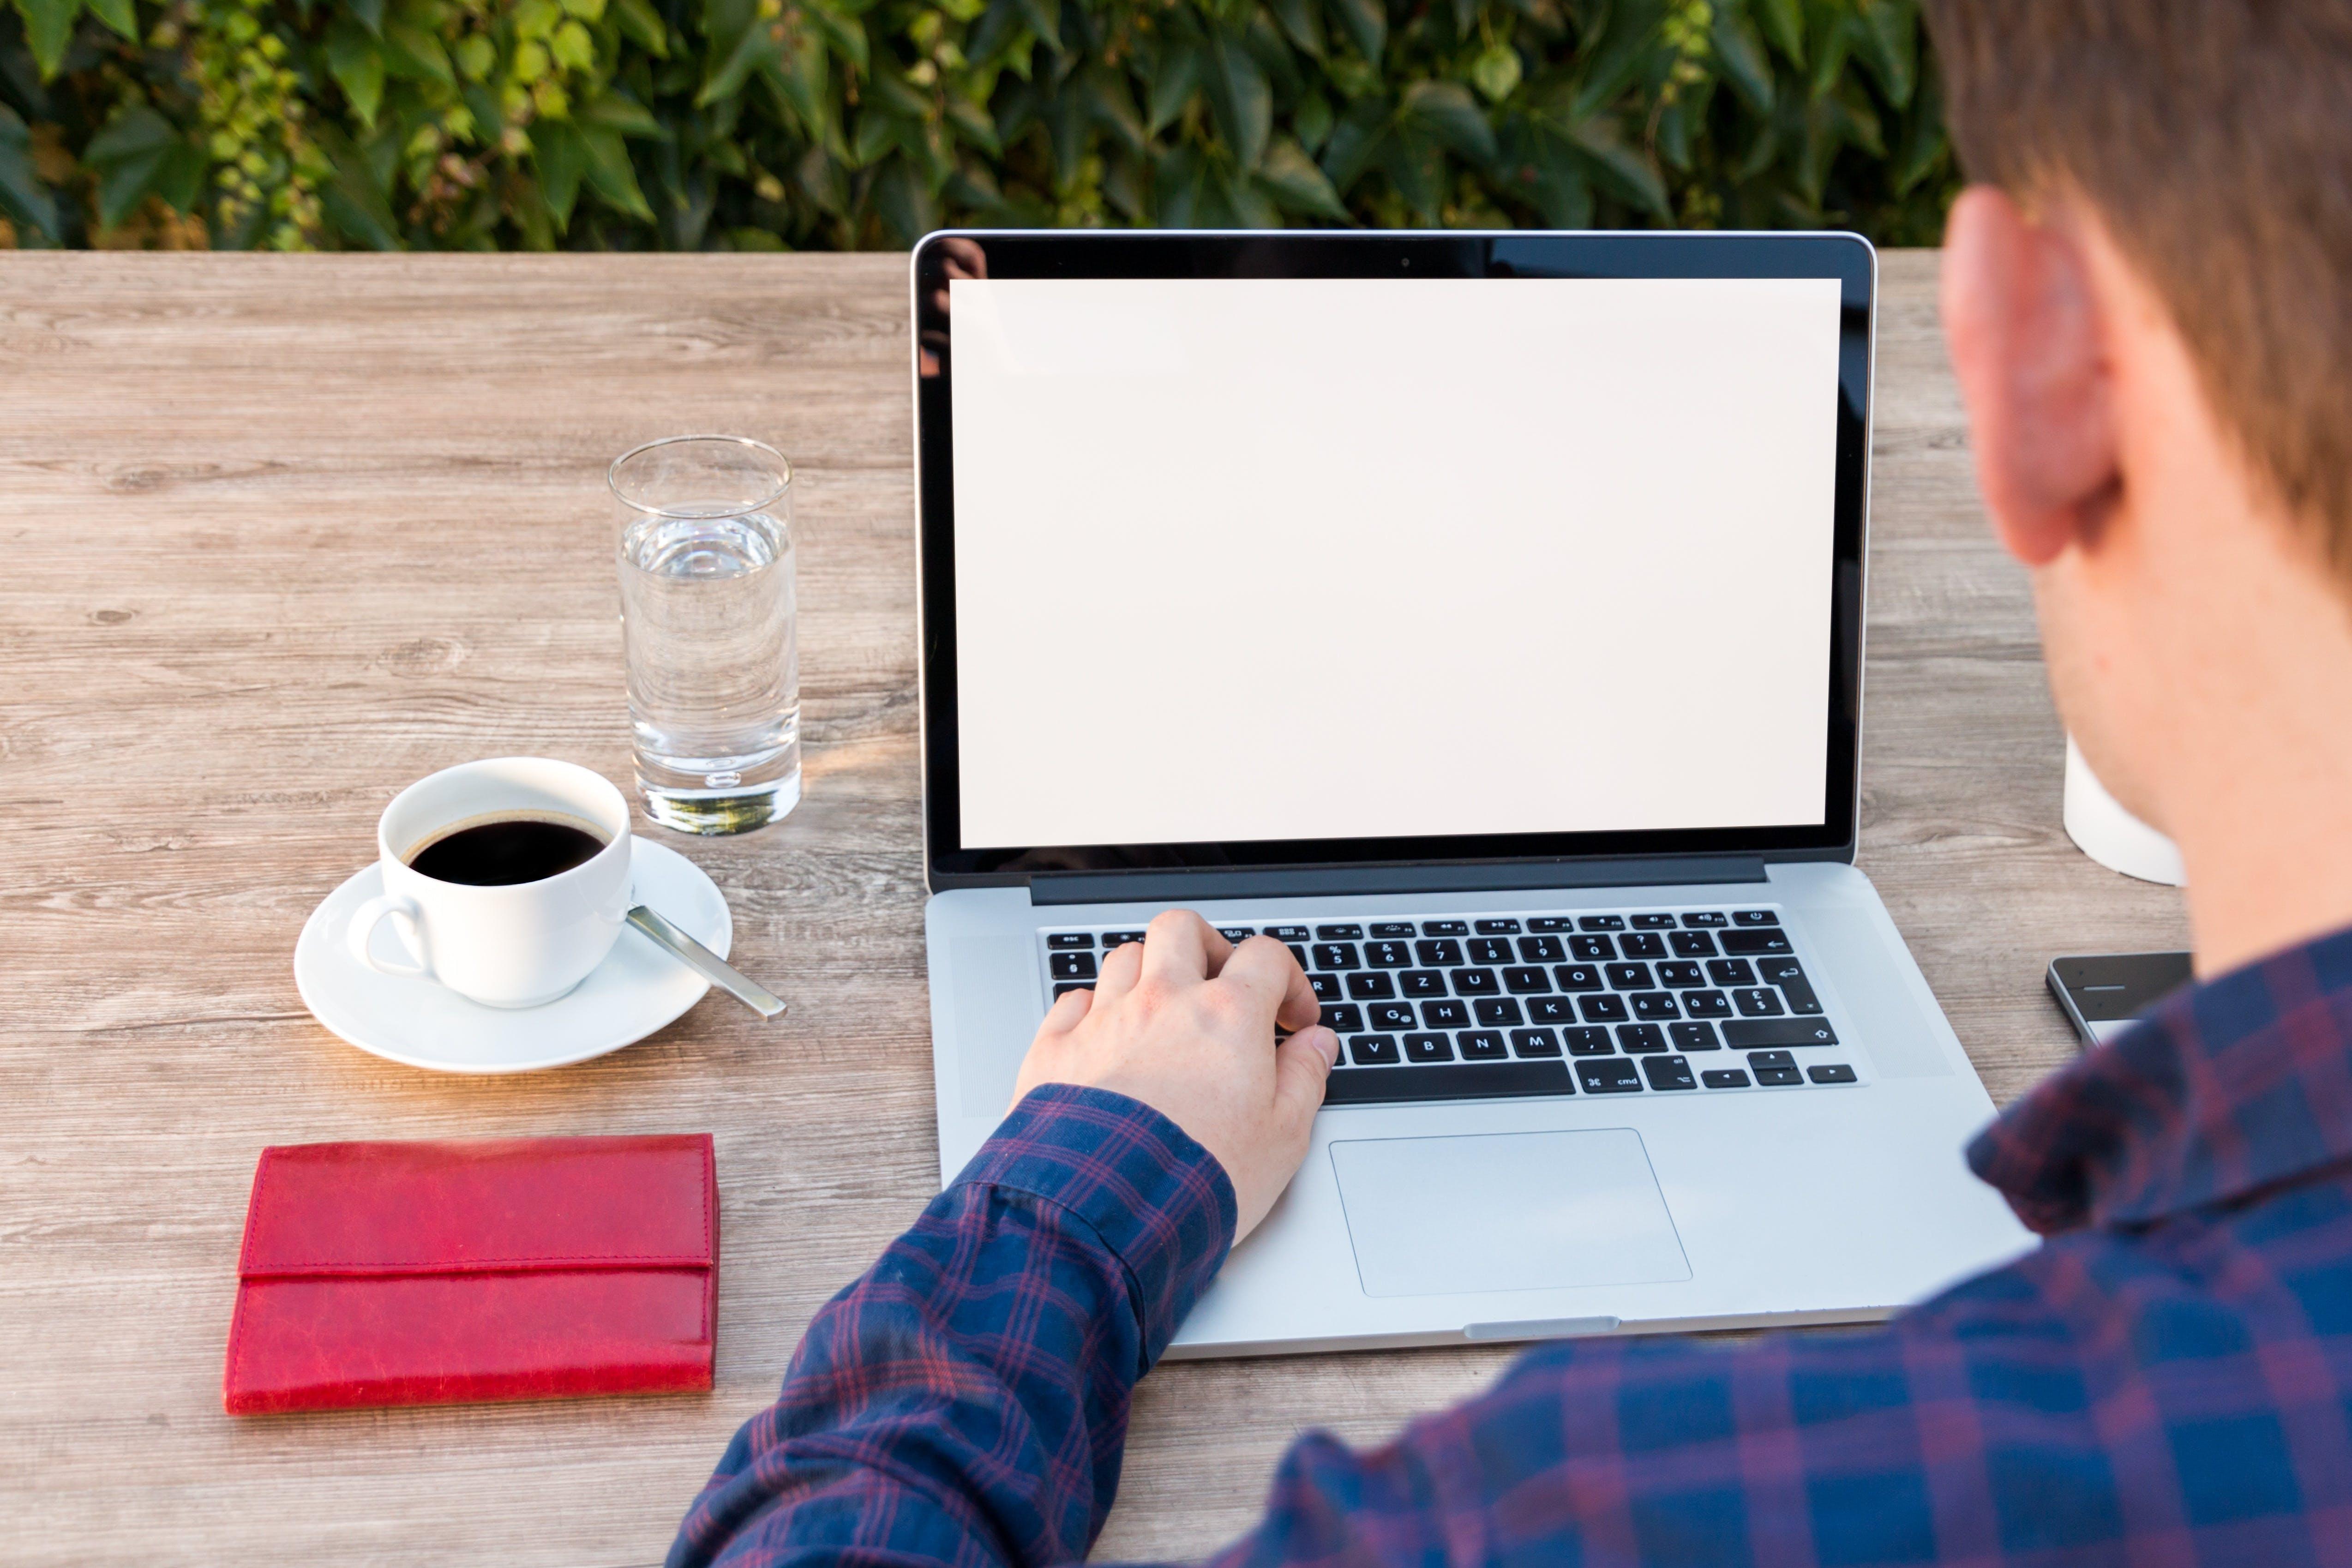 Man Sitting in Front of Macbook